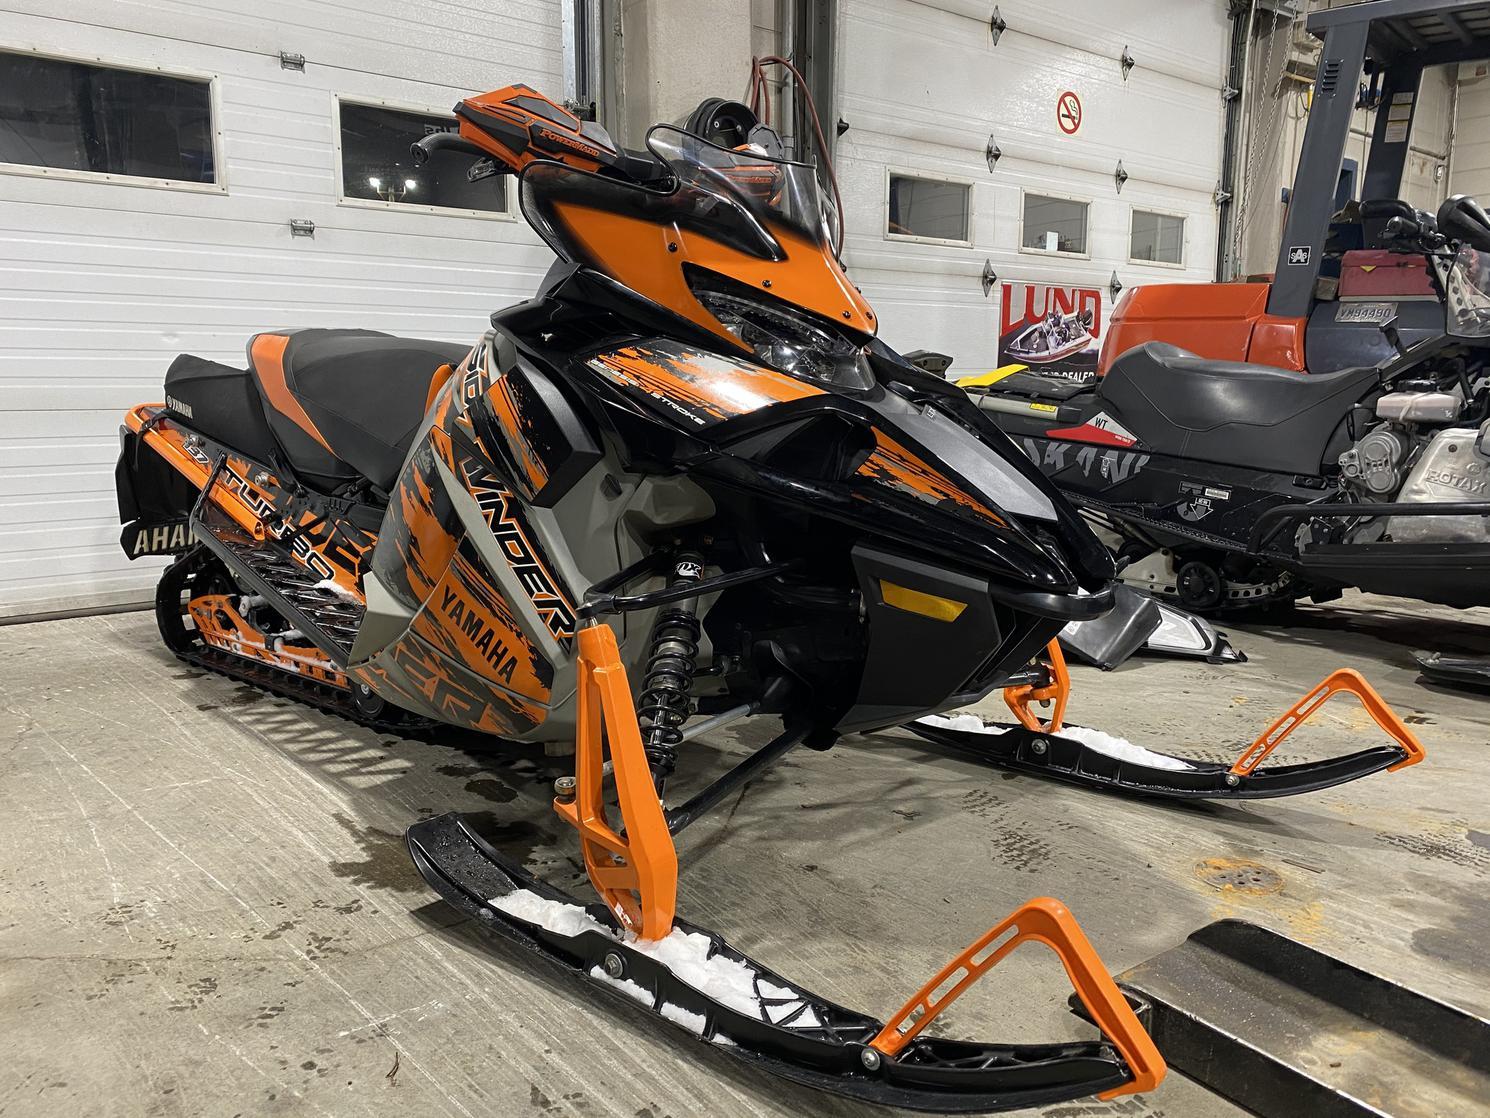 2017 Yamaha Sidewinder ltx se Sw